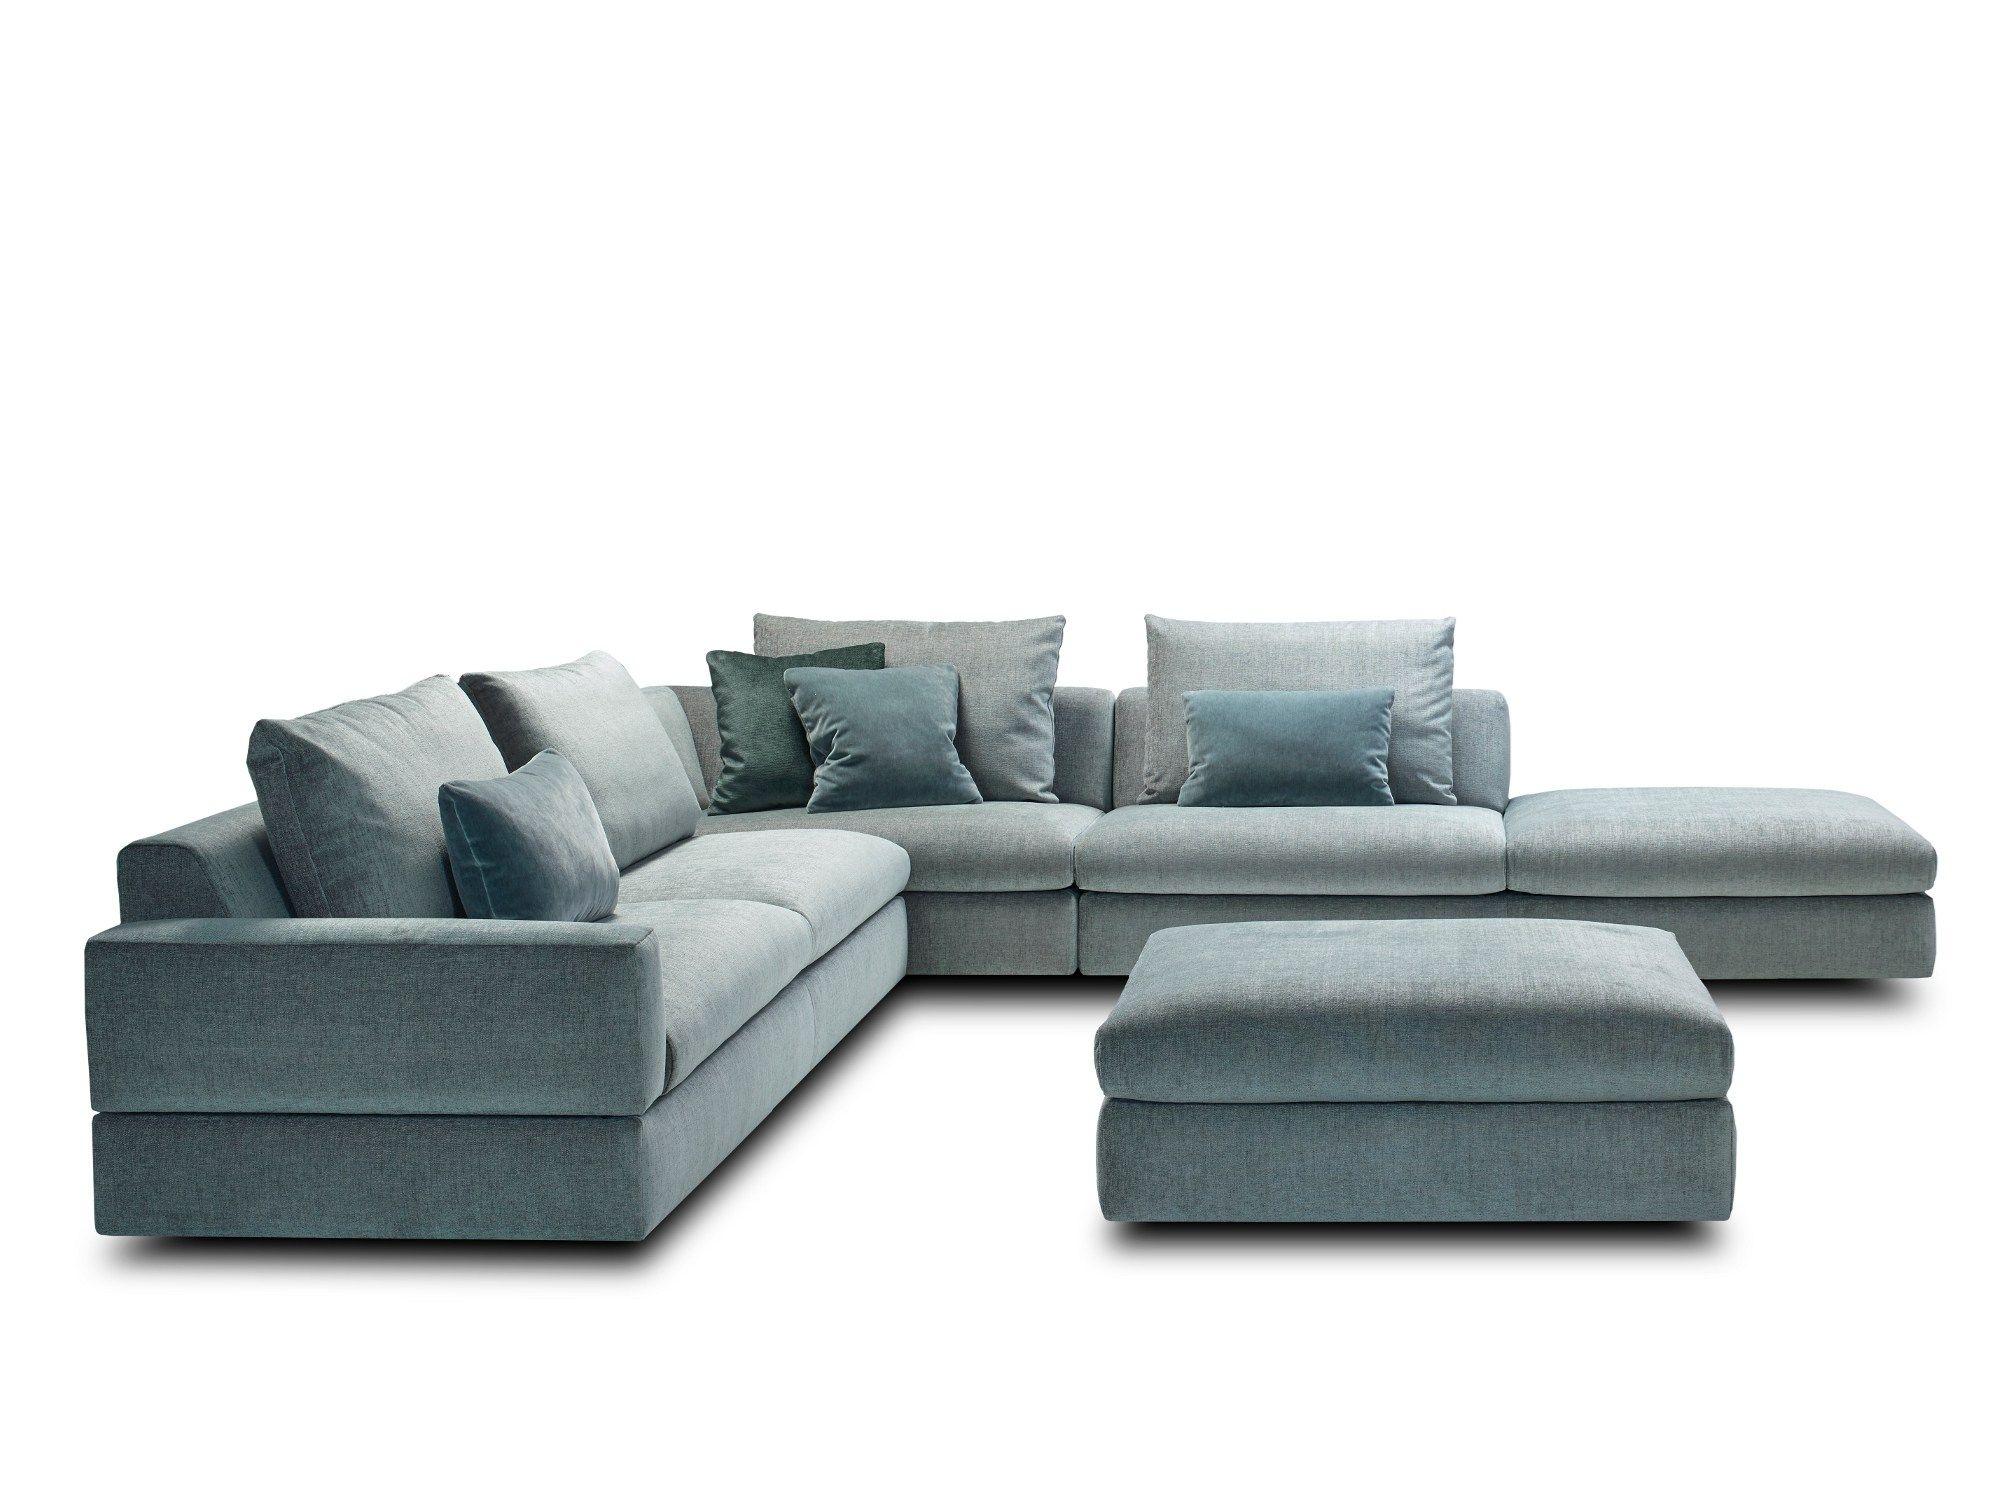 tigra divanbase modular sofa by jori design verhaert new products services. Black Bedroom Furniture Sets. Home Design Ideas